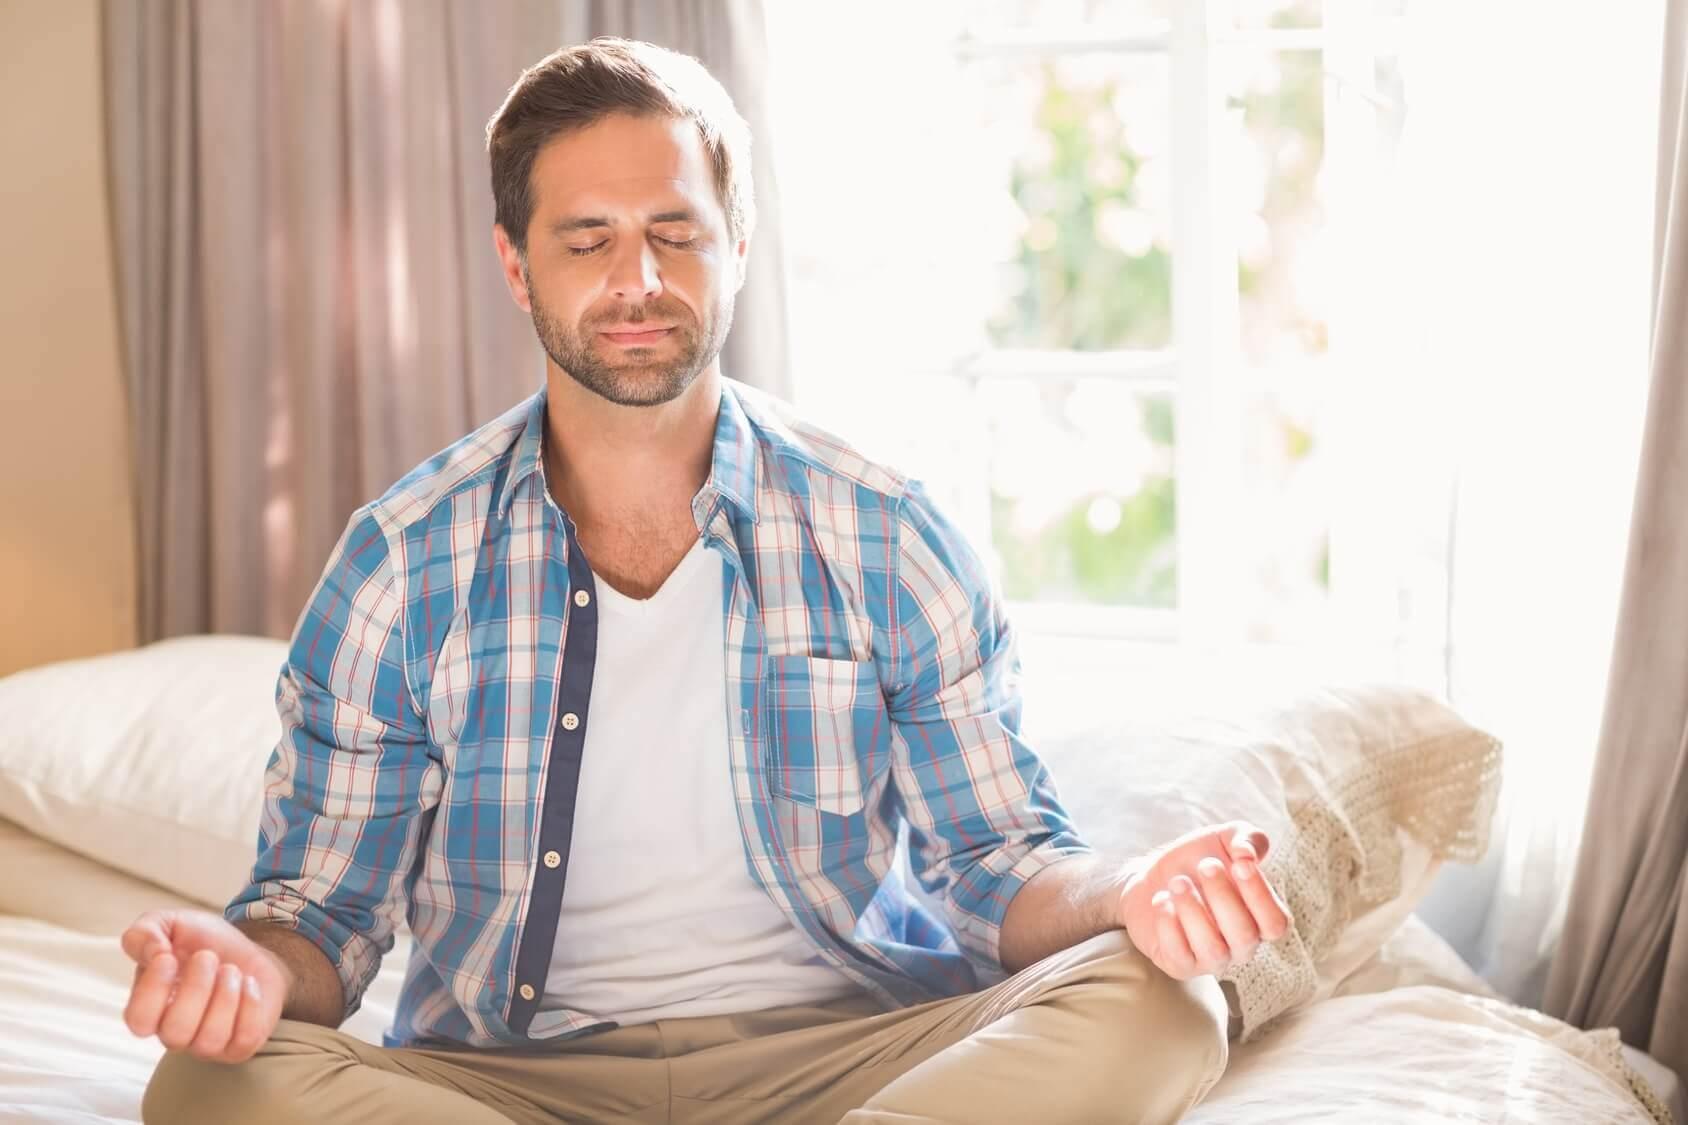 Homem meditando na cama